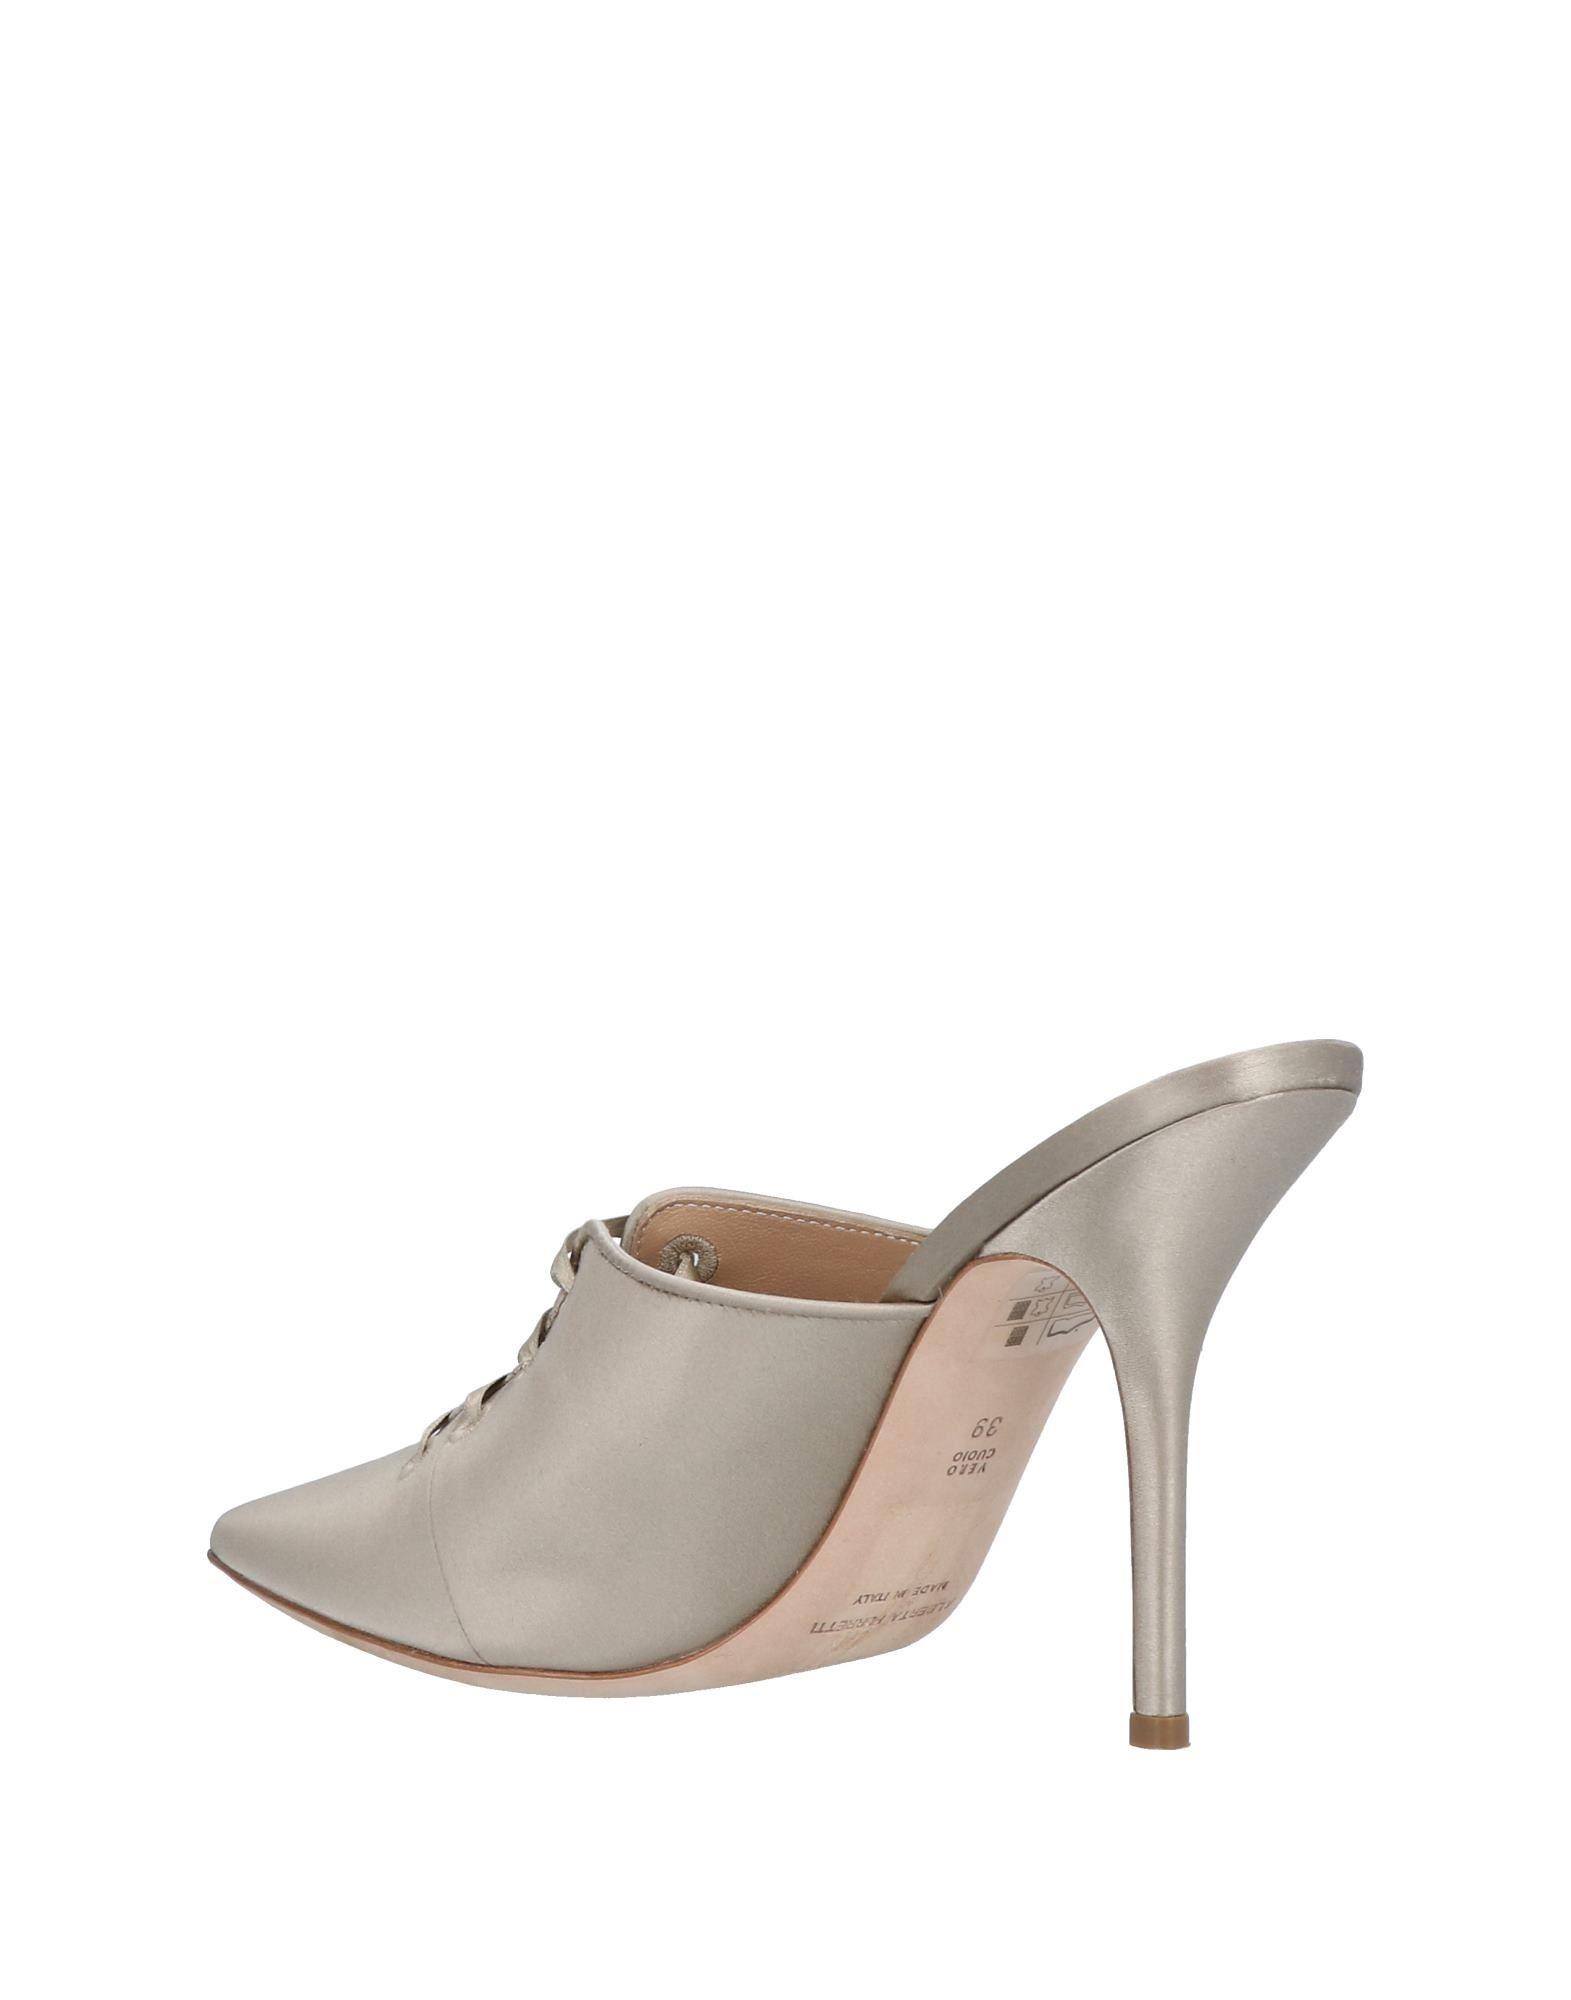 Alberta Ferretti Pantoletten Damen Beliebte  11460603GW Beliebte Damen Schuhe 6c9e73